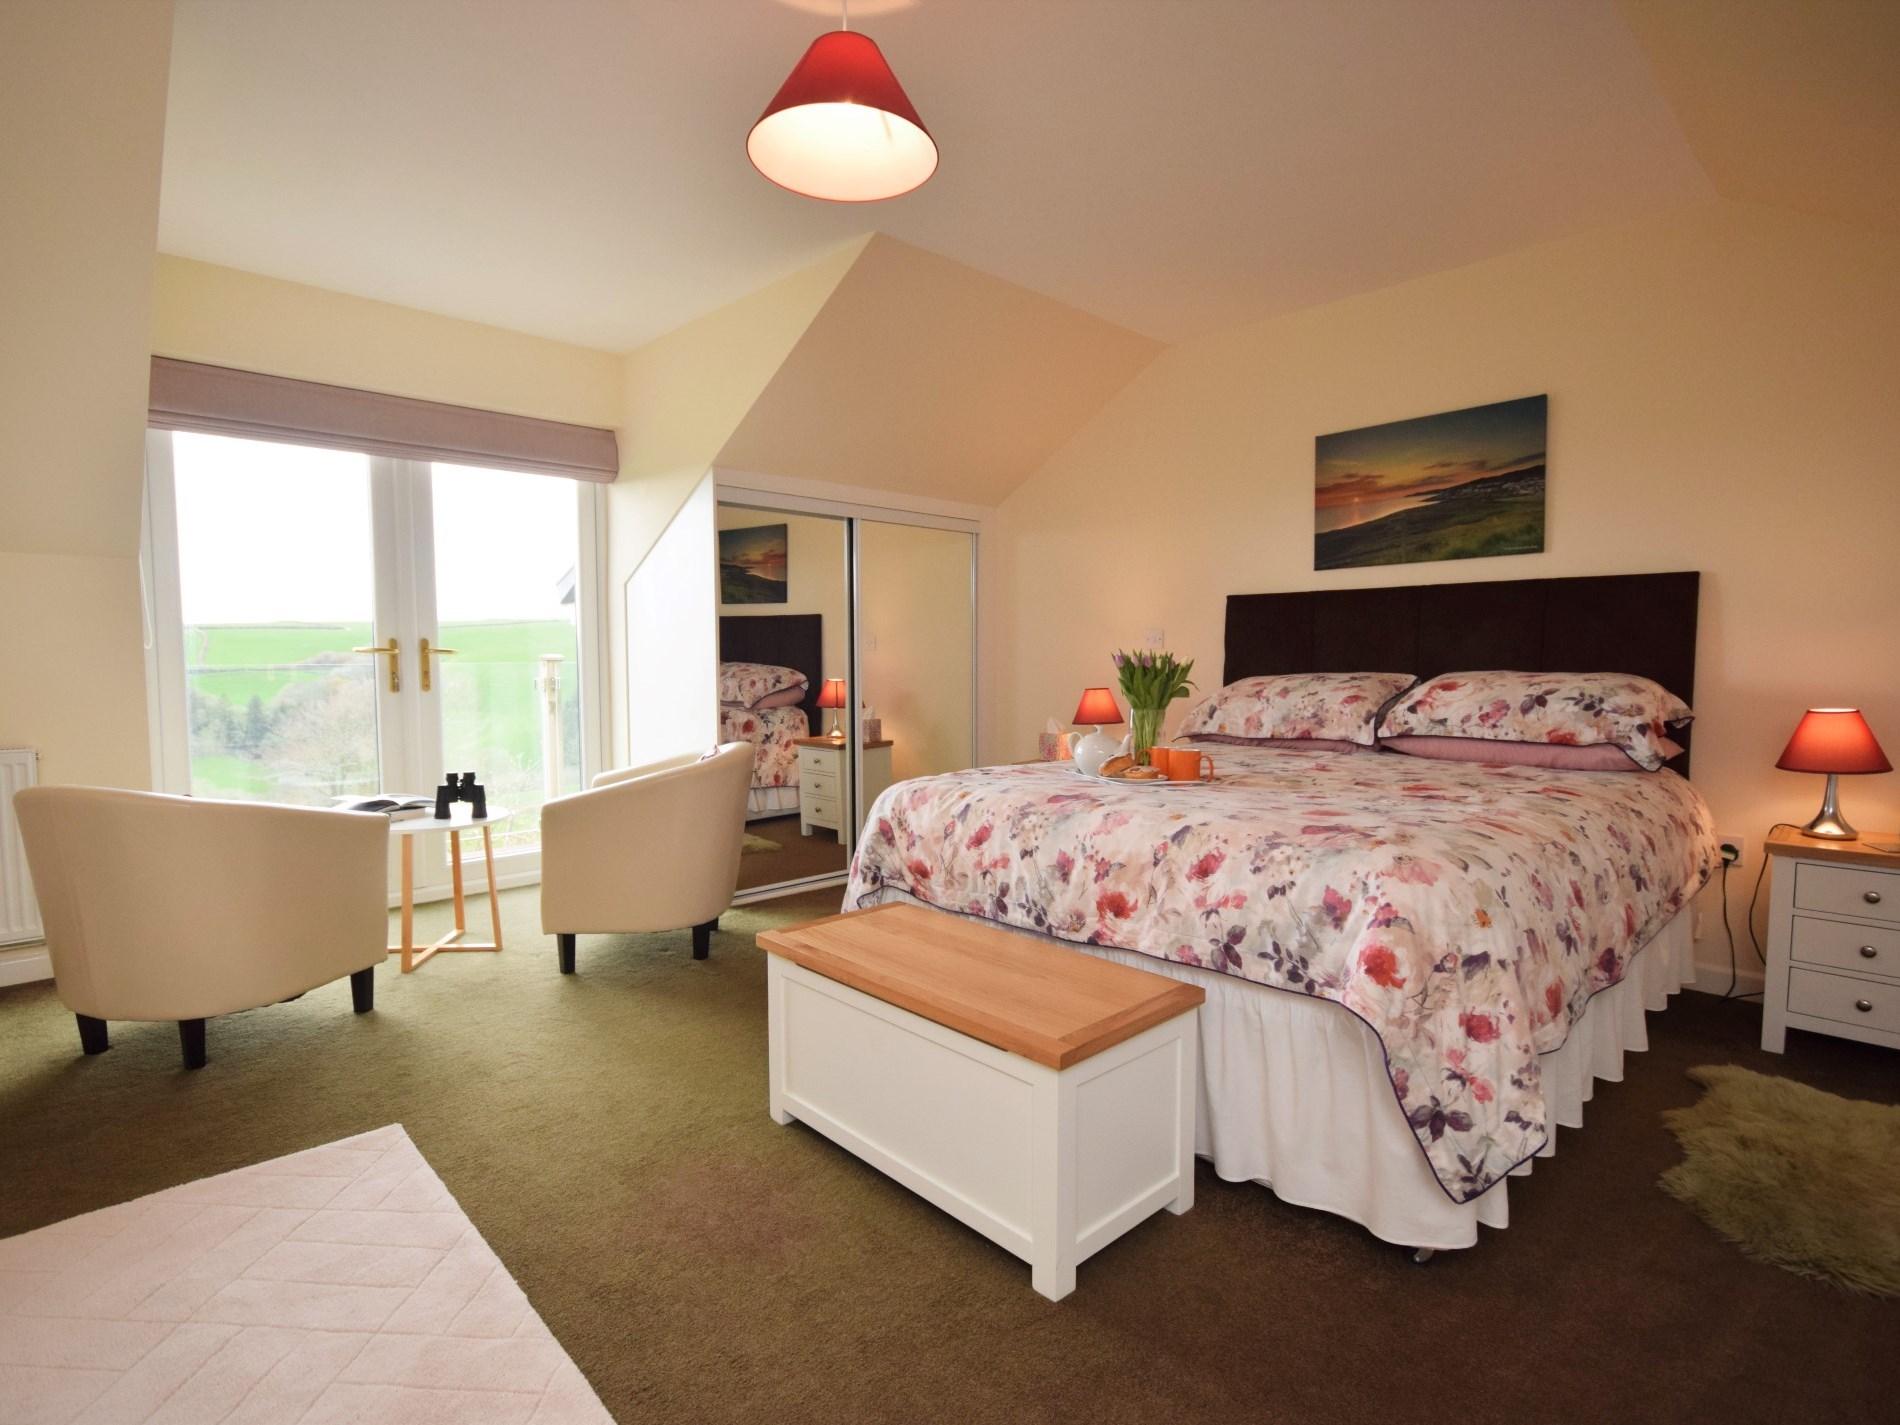 1 Bedroom Wing in North Devon, Devon